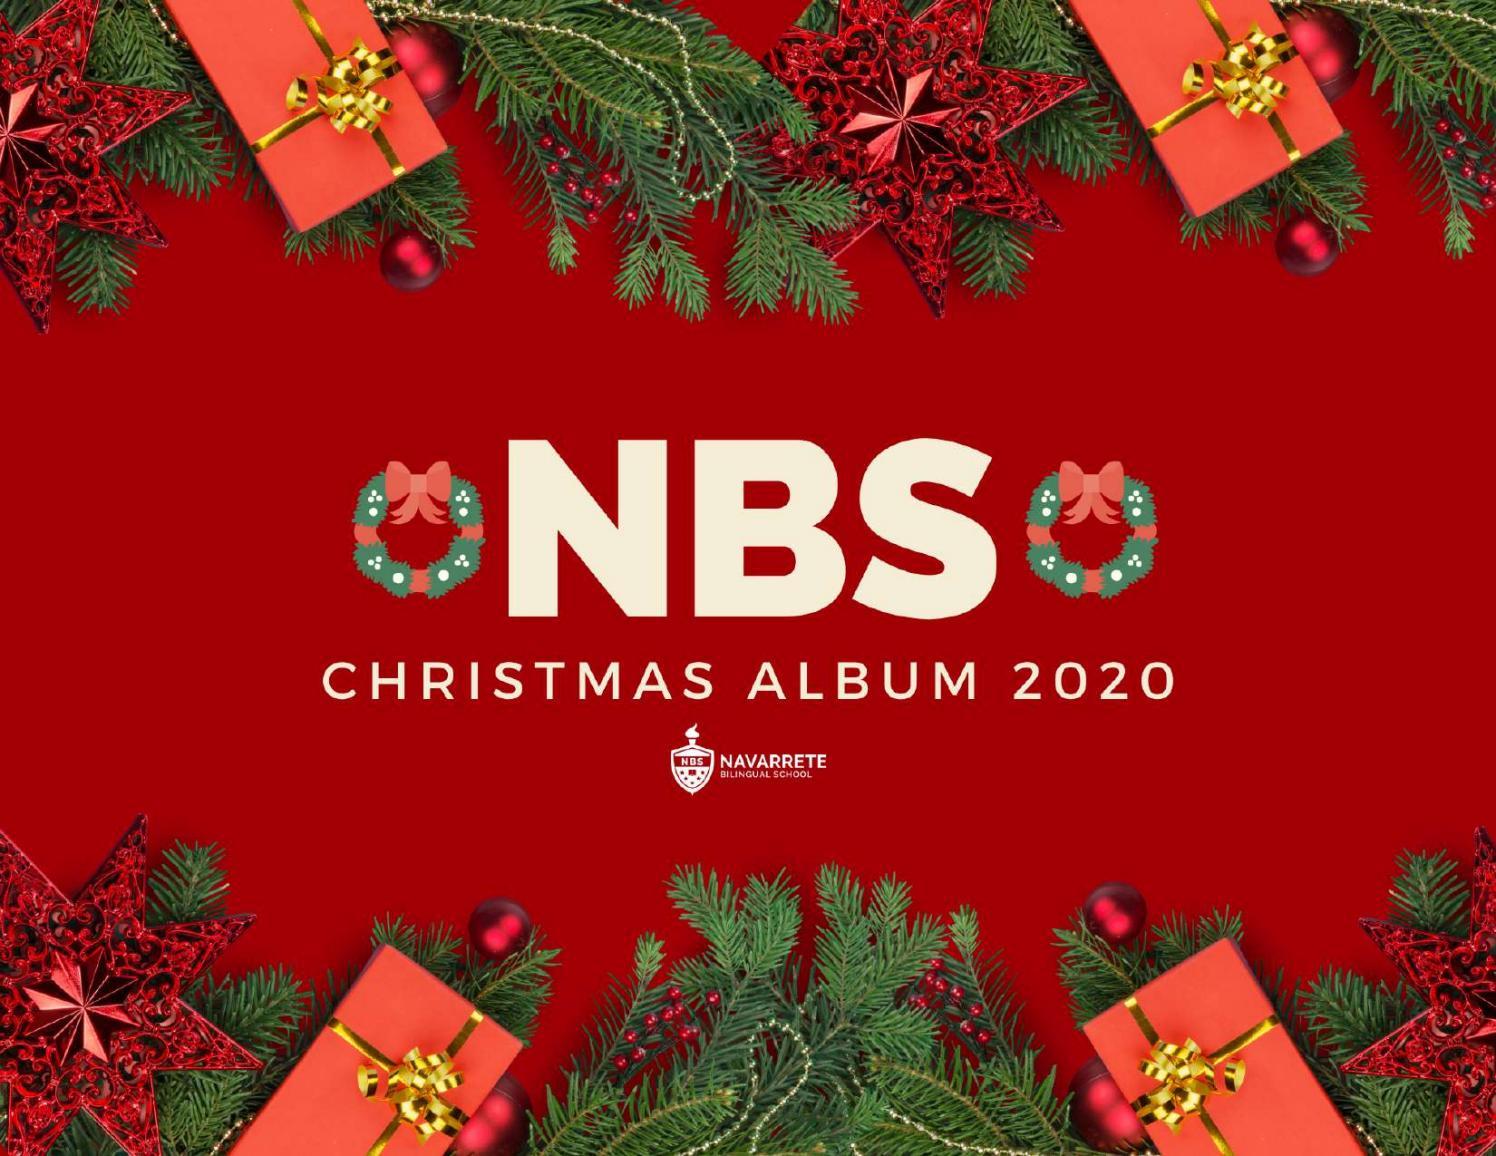 Nbs Christmas Specials 2021 Nbs Christmas Allbum 2020 By Navarretebilingualschool Issuu